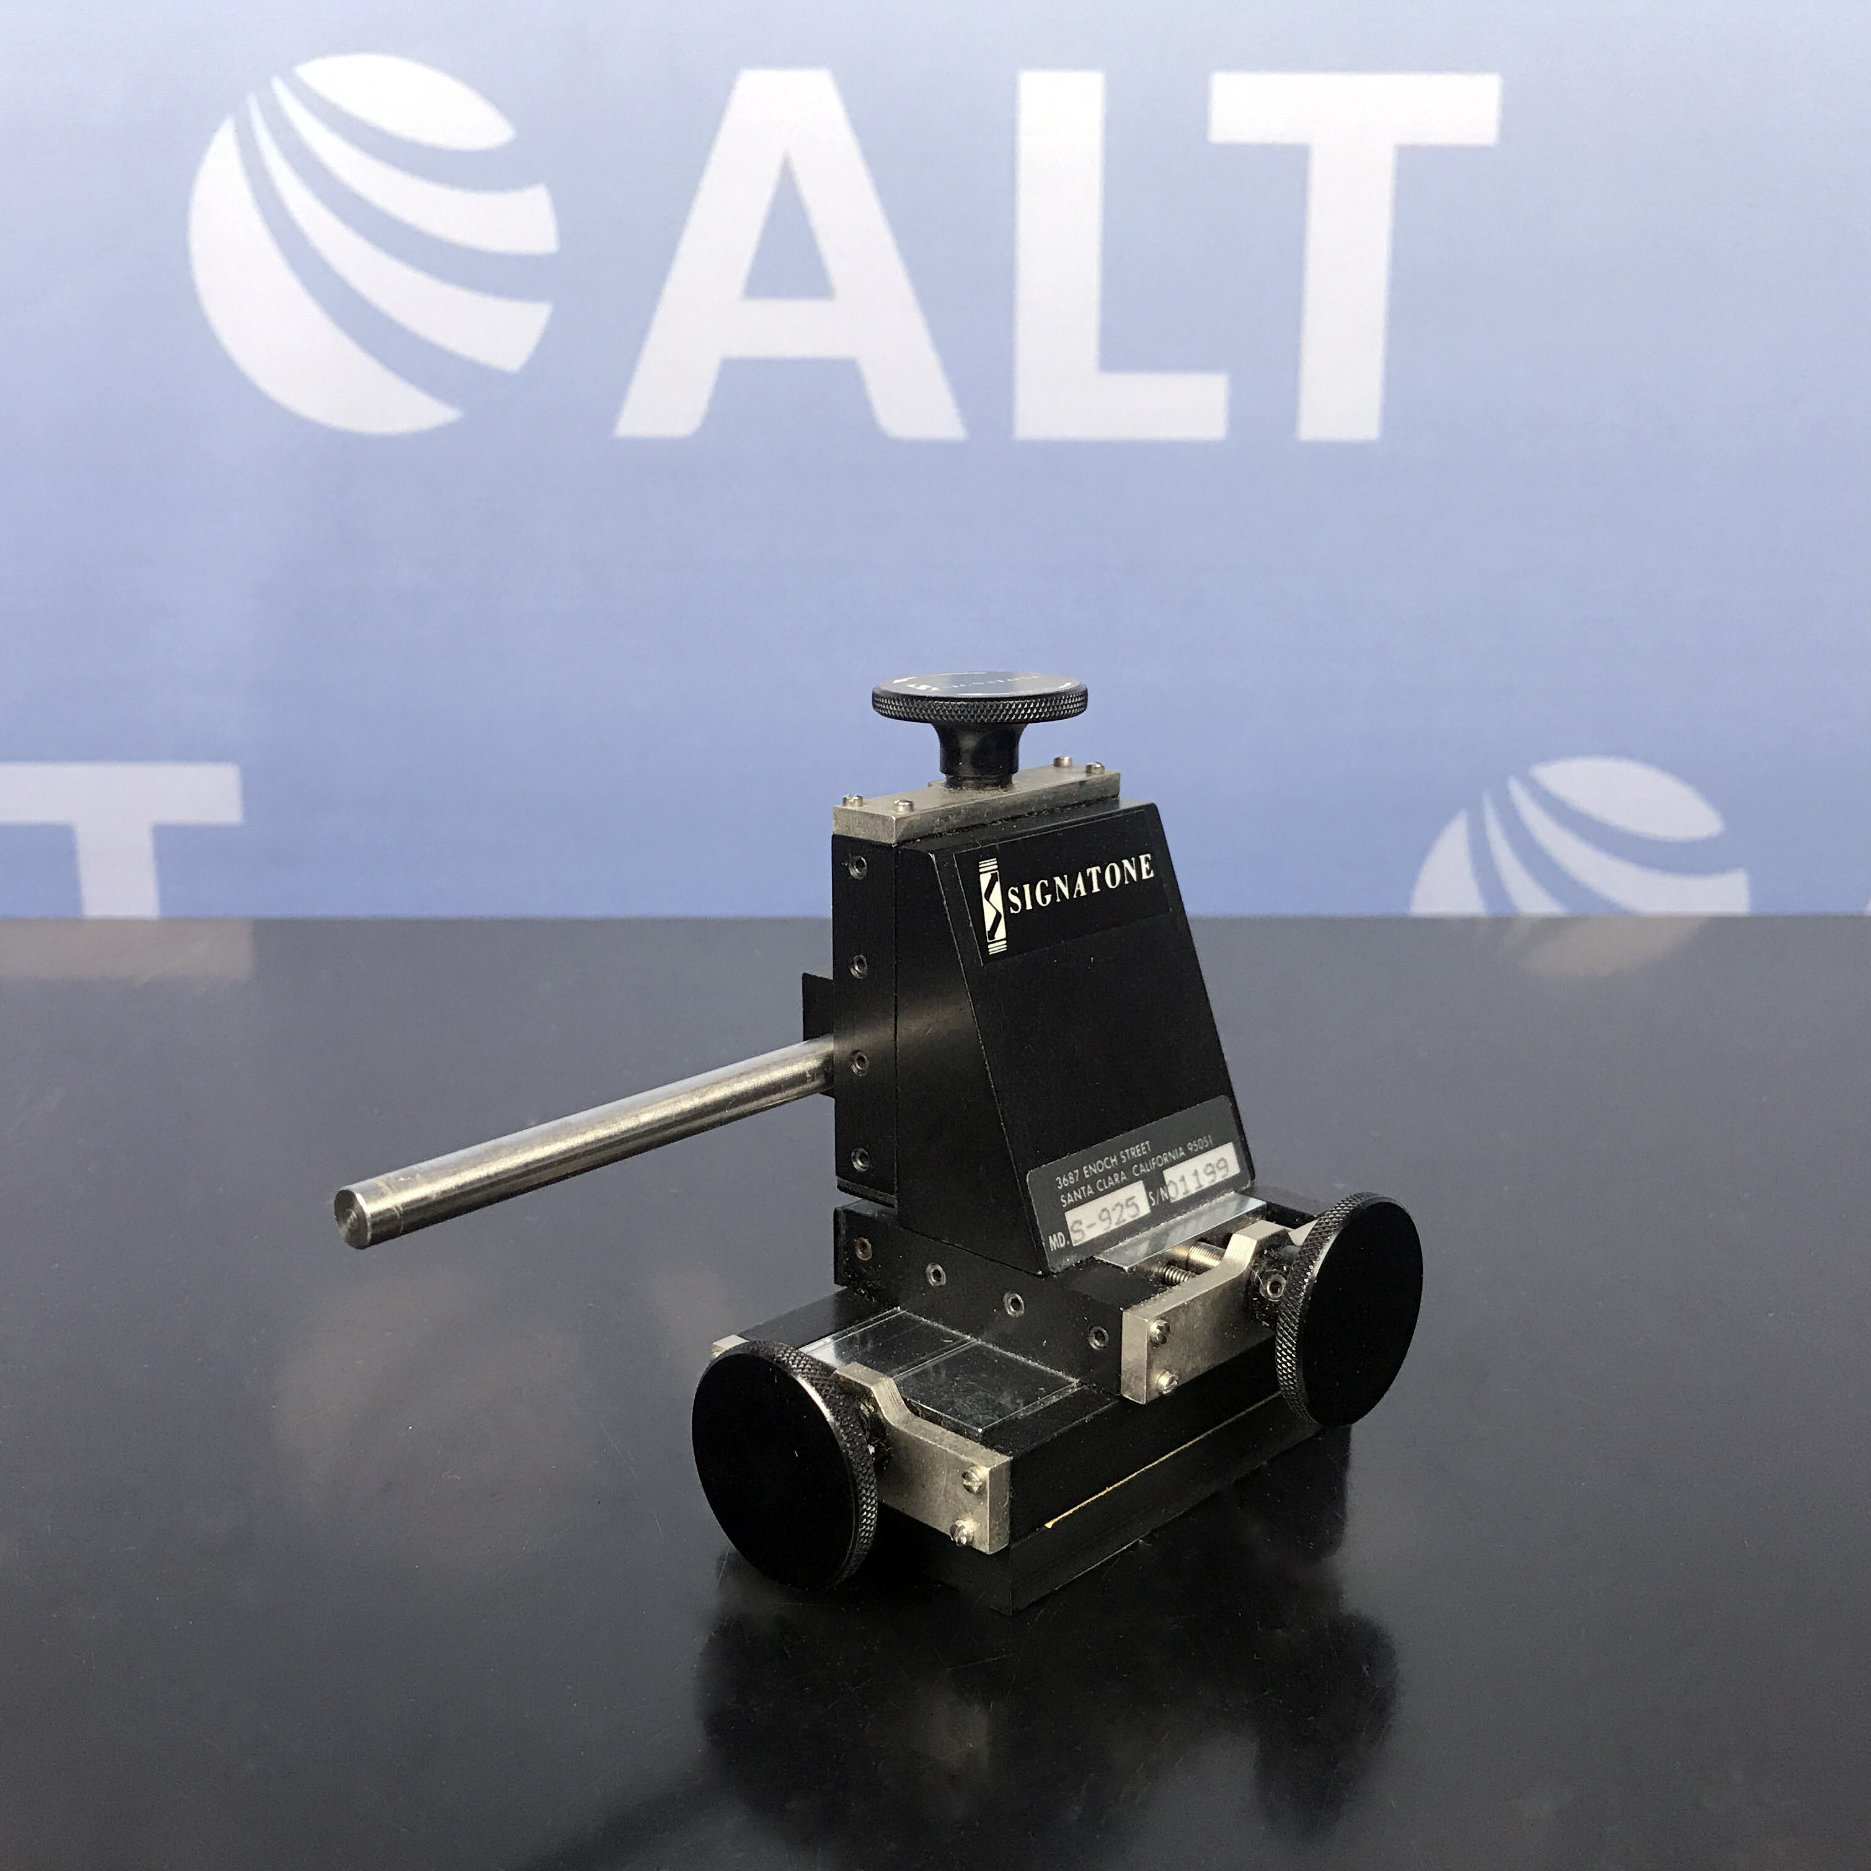 Signatone S-925 Micromanipulator Probe Positioner Image